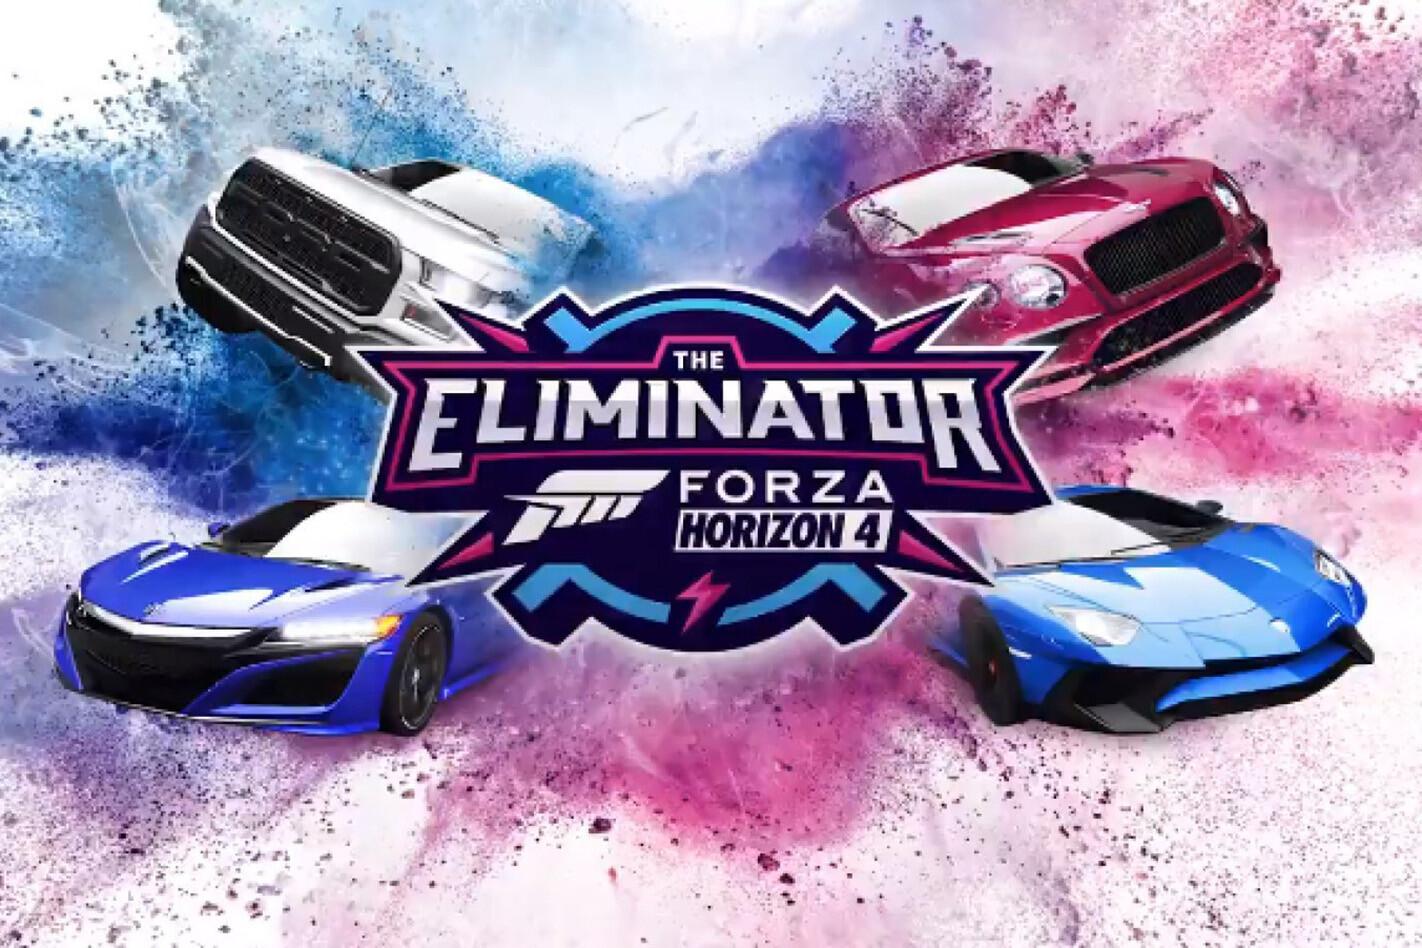 Forza Horizon 4 Eliminator